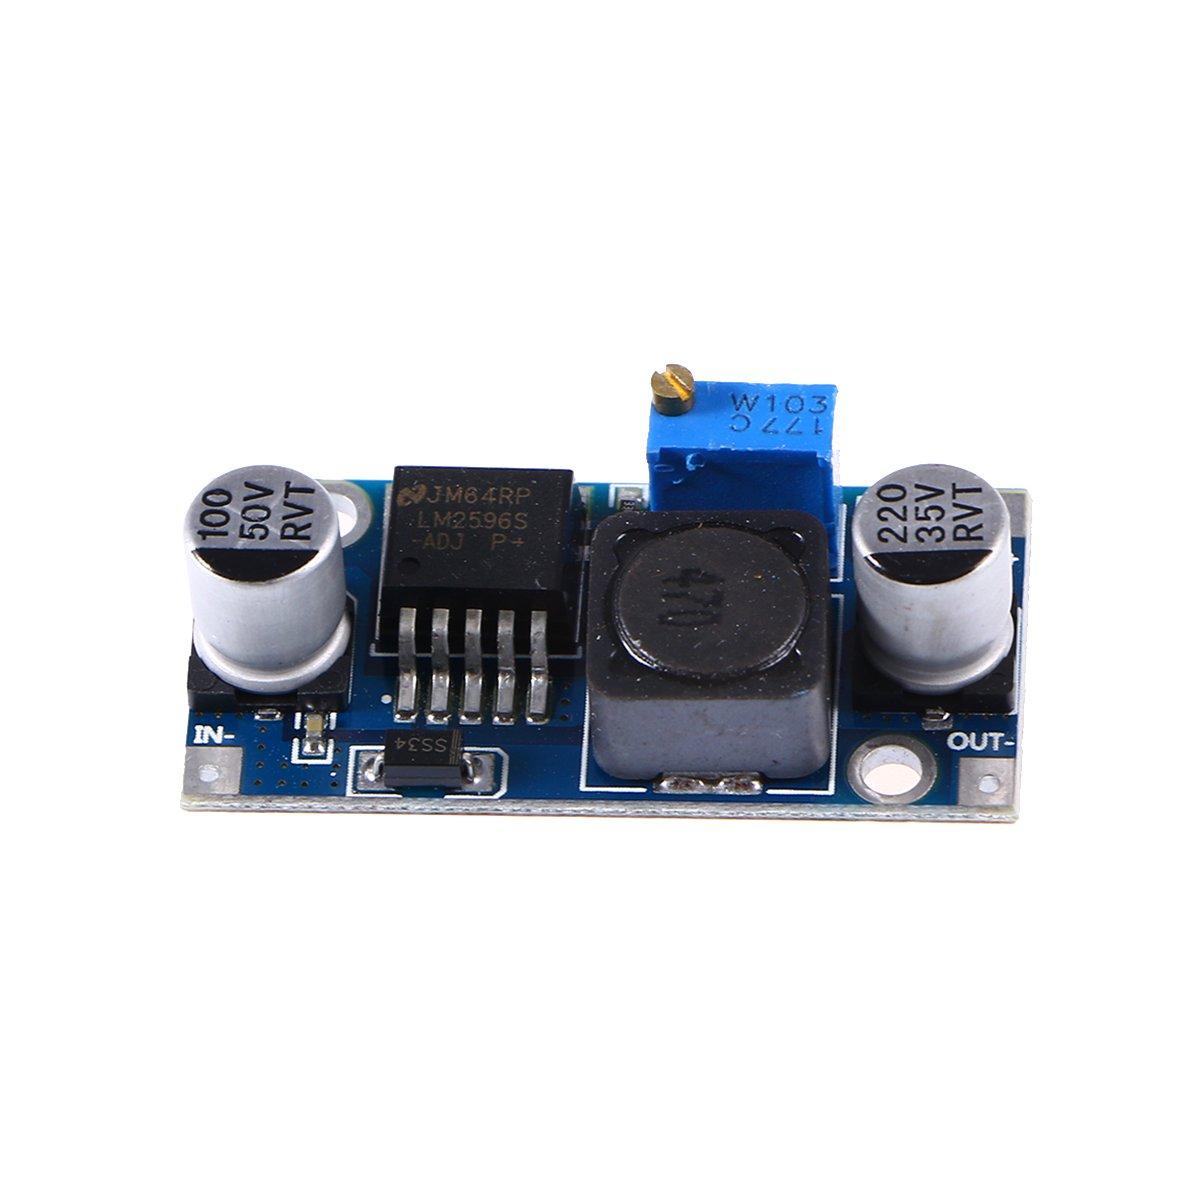 5 m/ódulos Regulador de tensi/ón LM2596/DC-DC 1.23 Convertidor Step-Down 30V Winomo